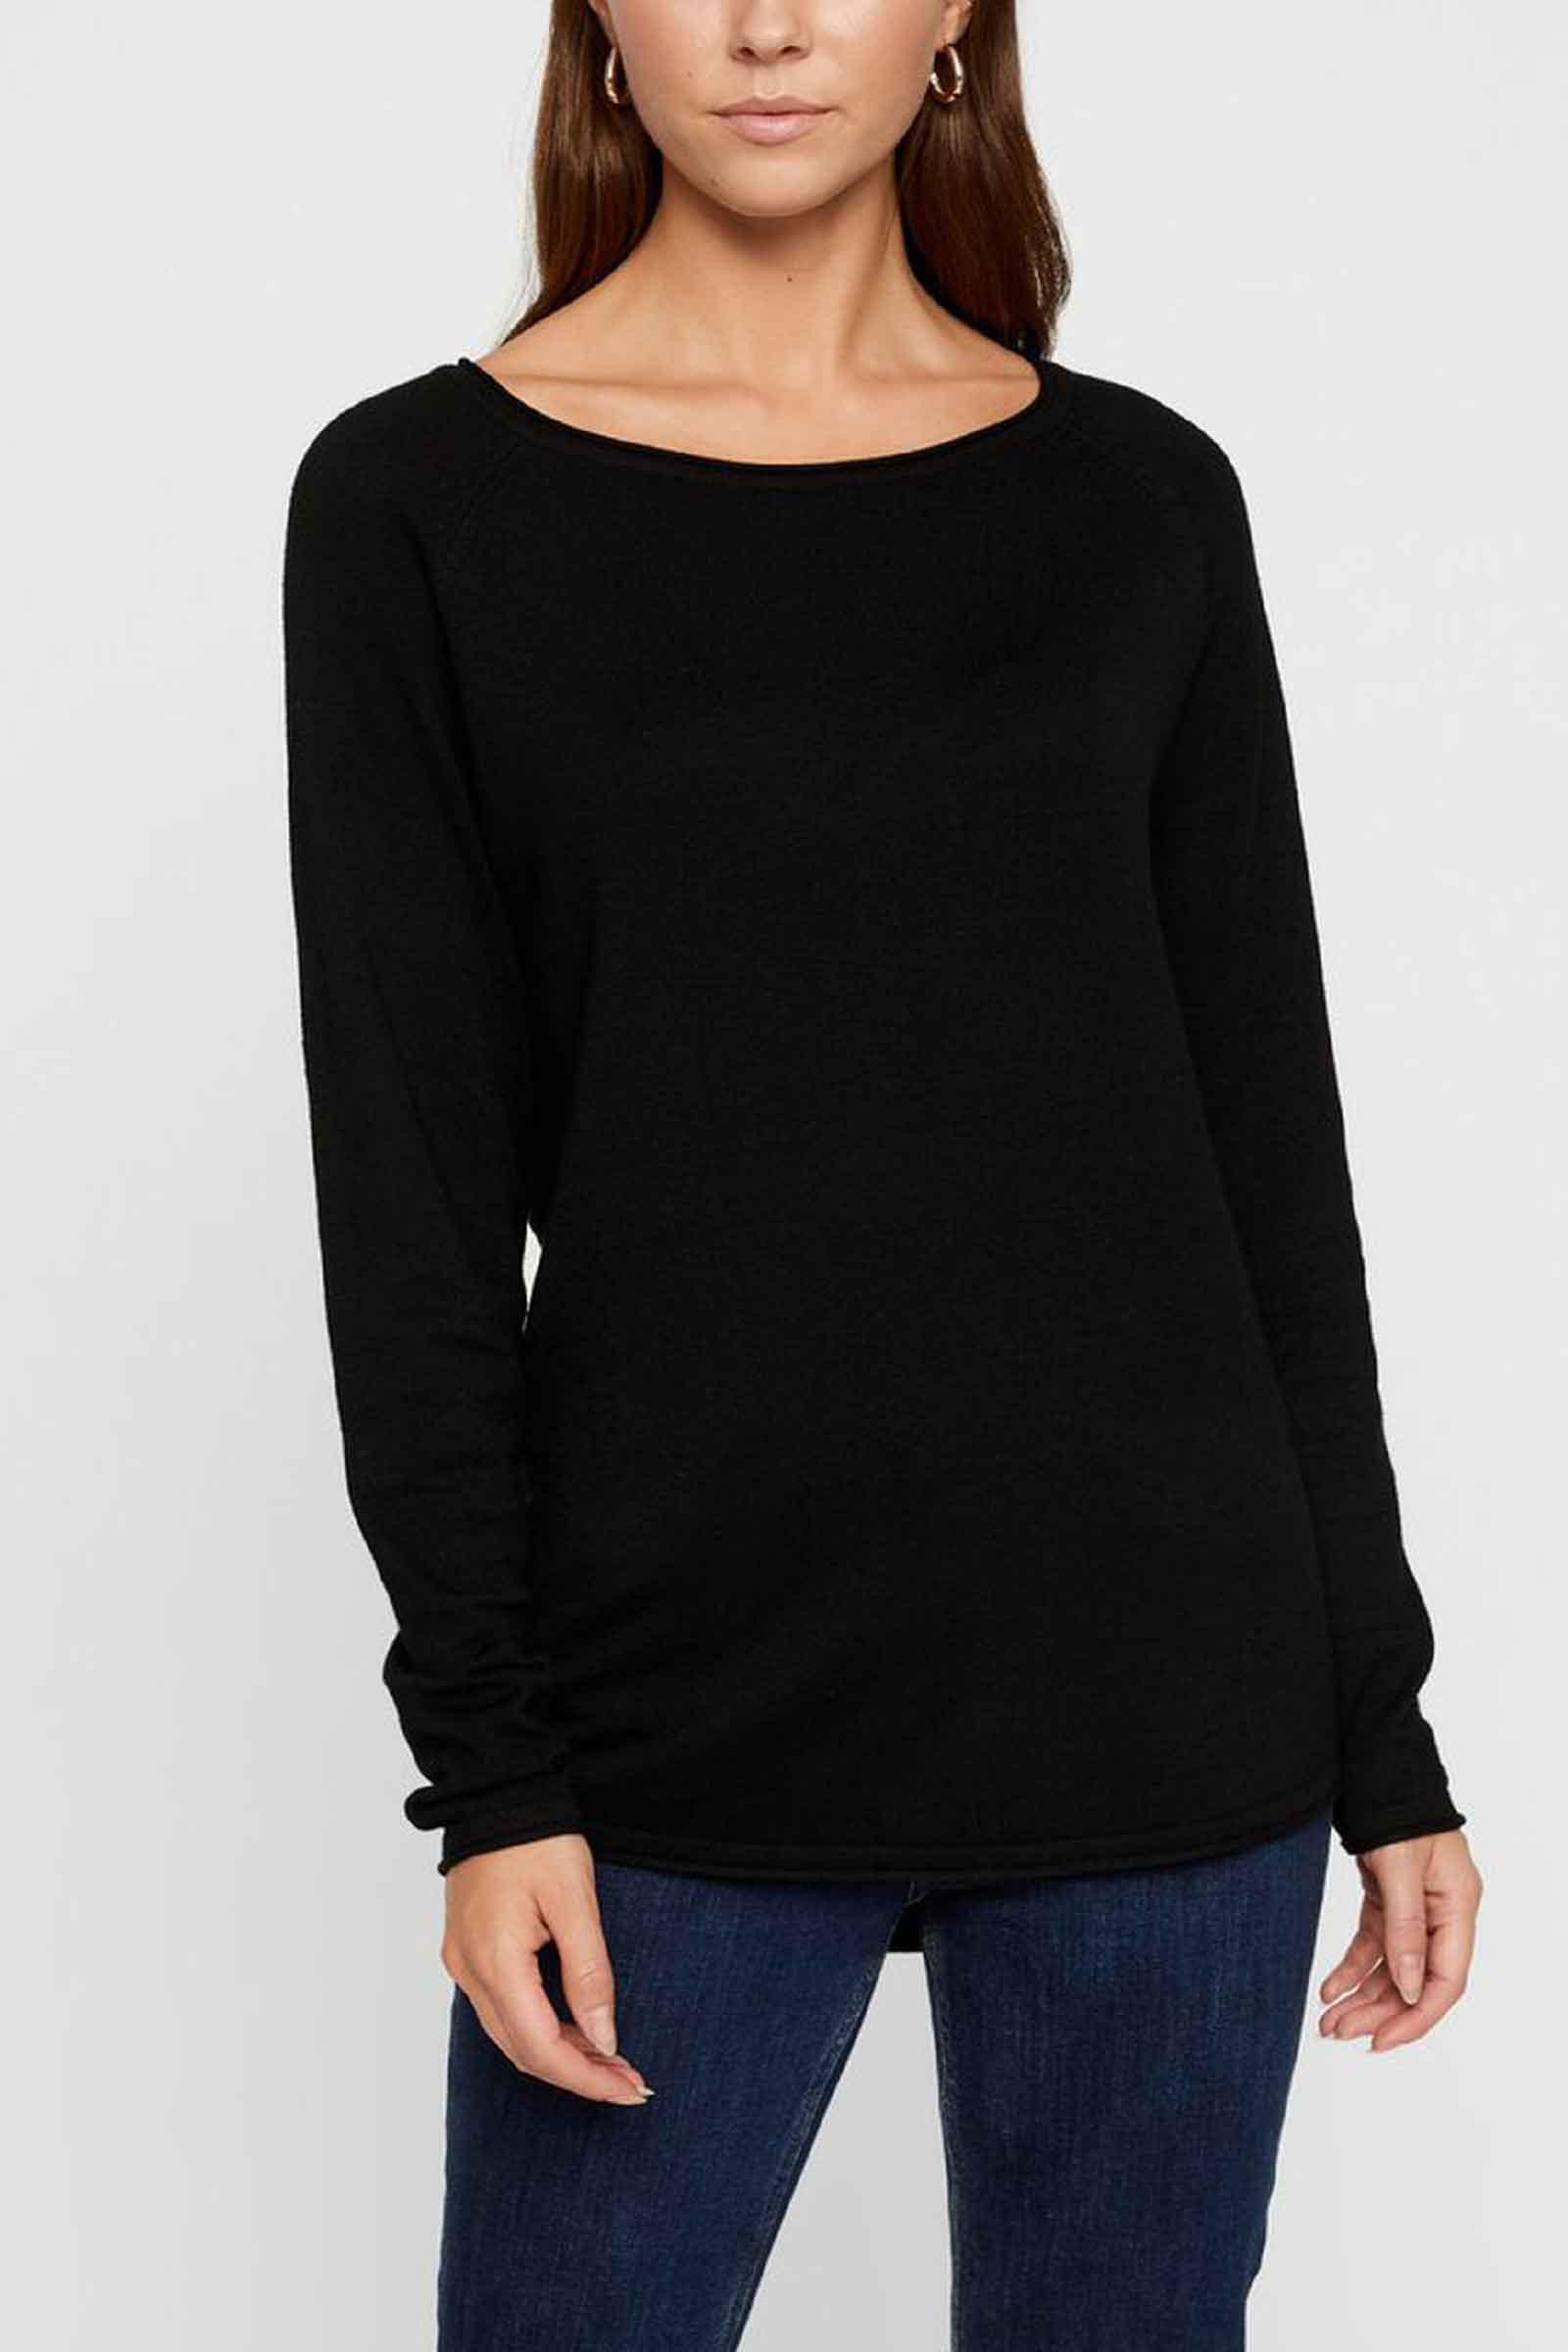 Women's Black Sweater VERO MODA | Mesh | 10220902Black